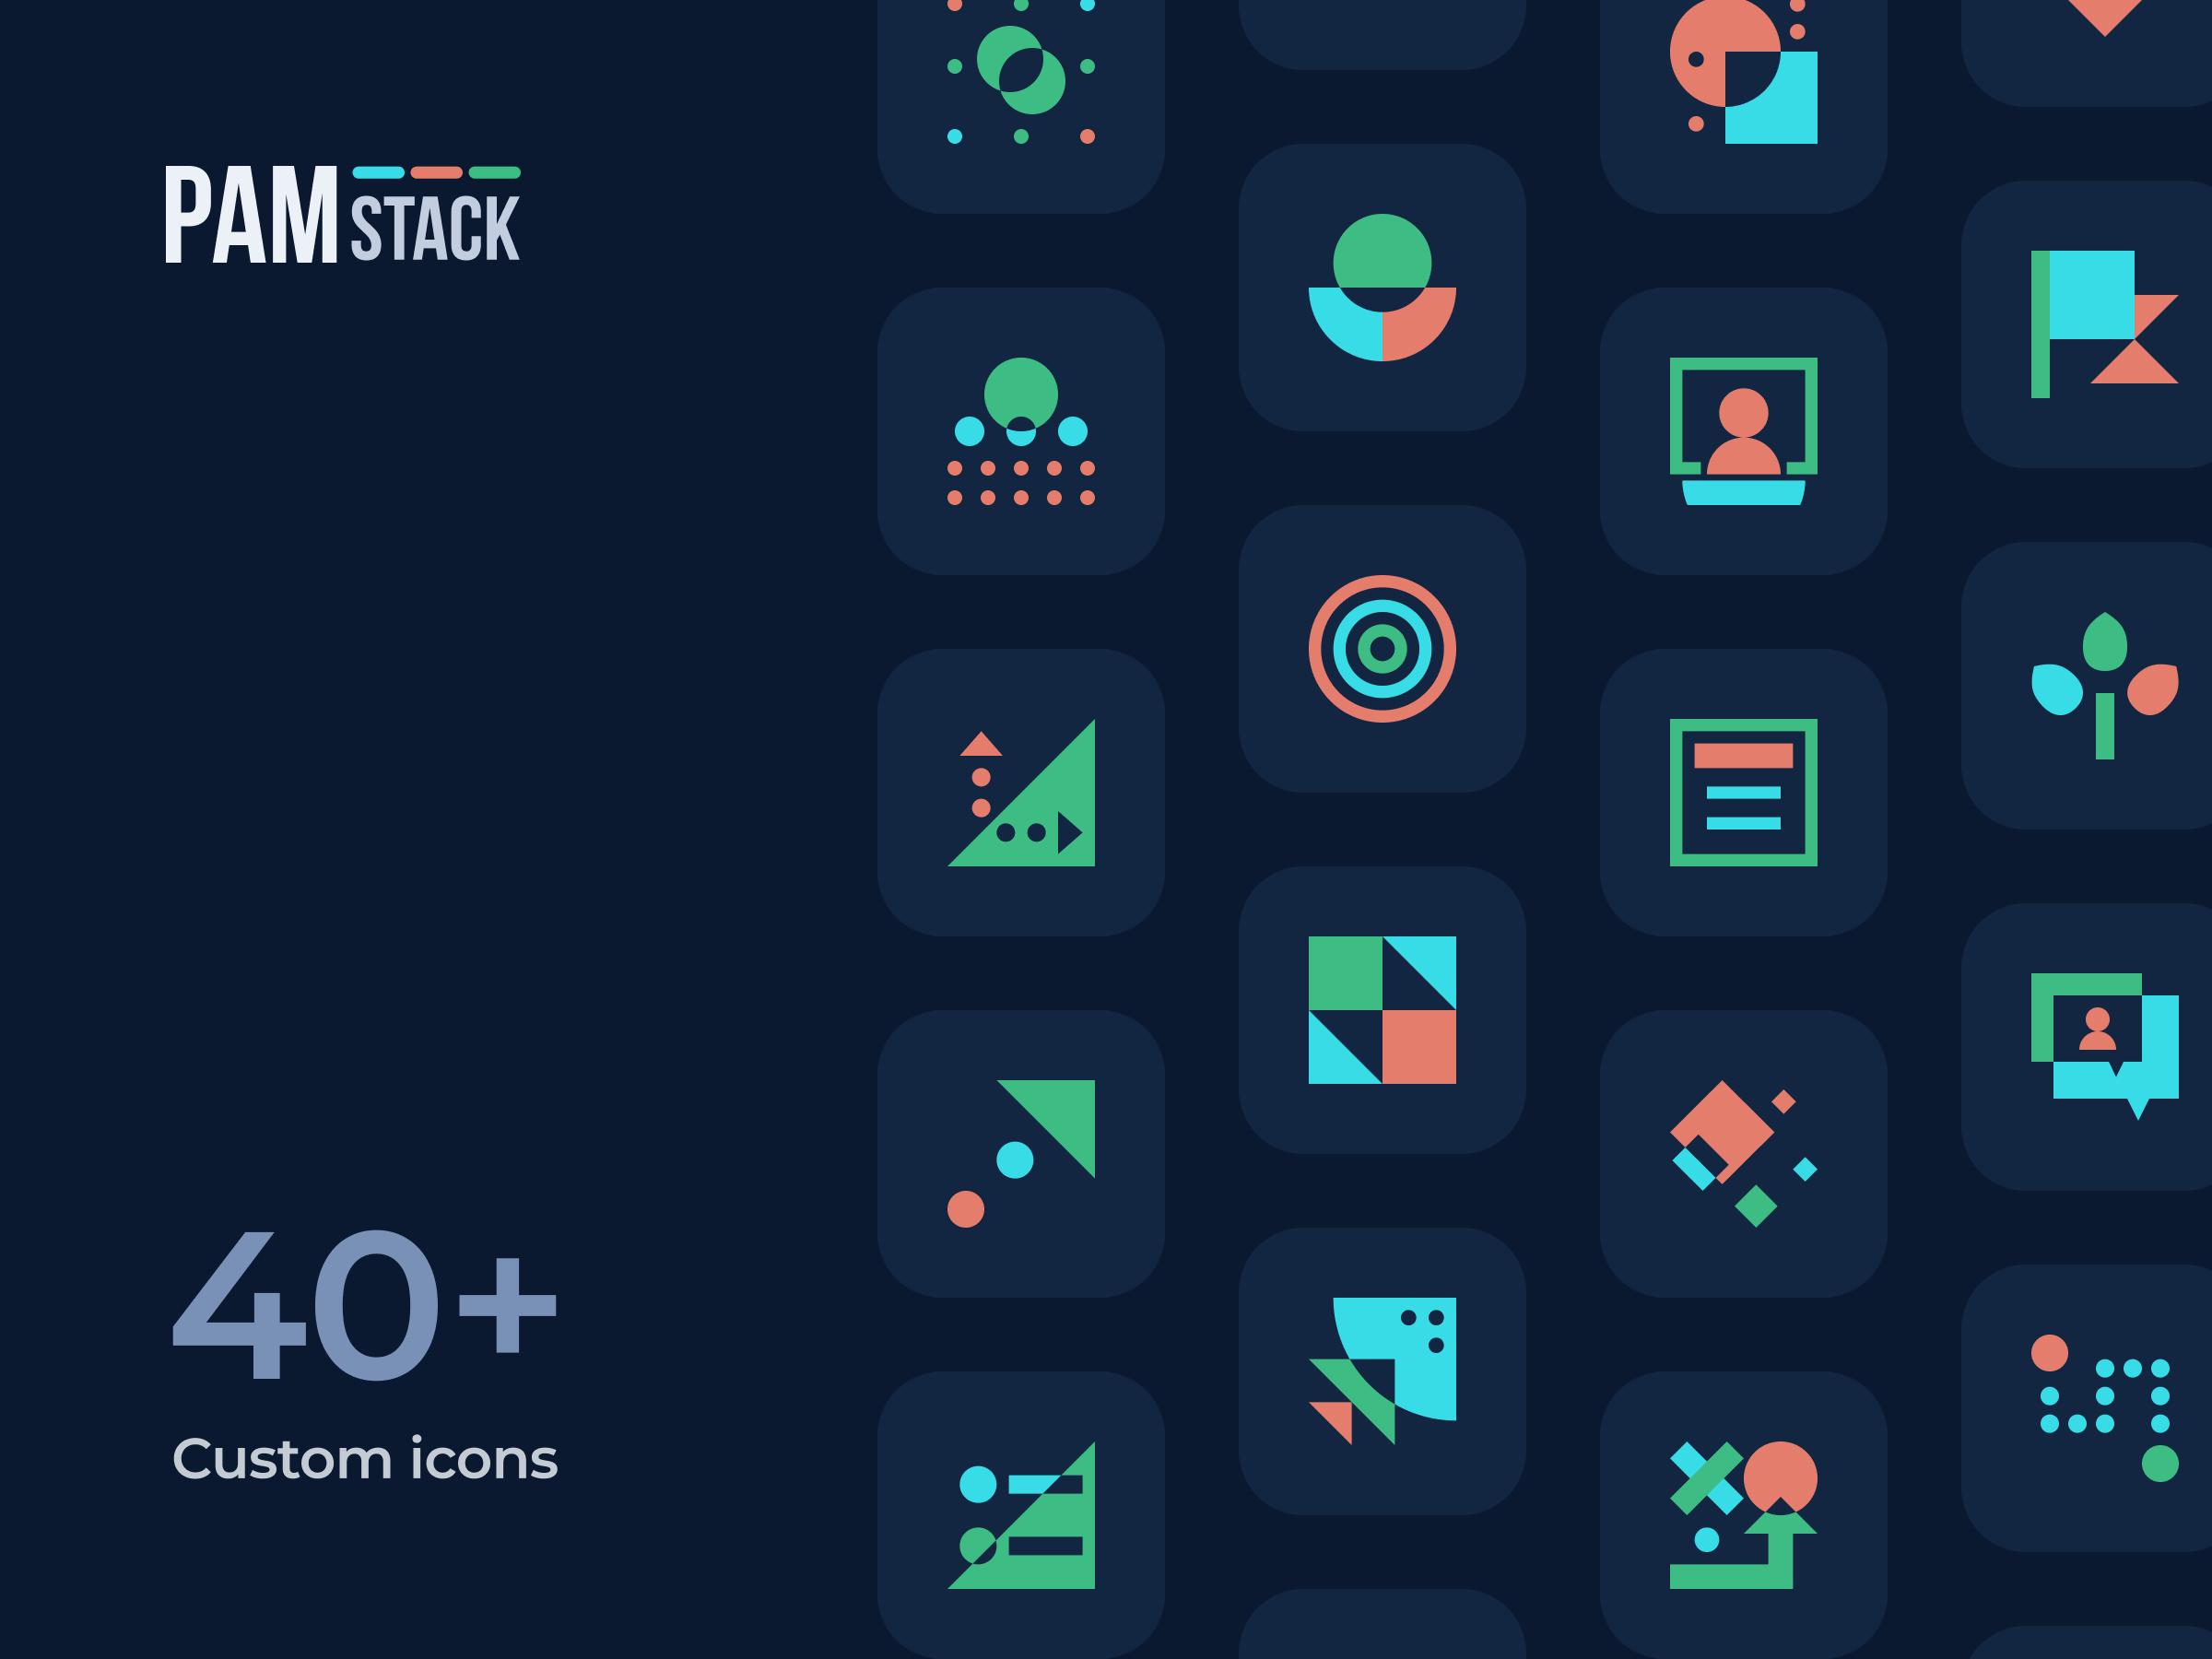 Custom icon set - PAM stack